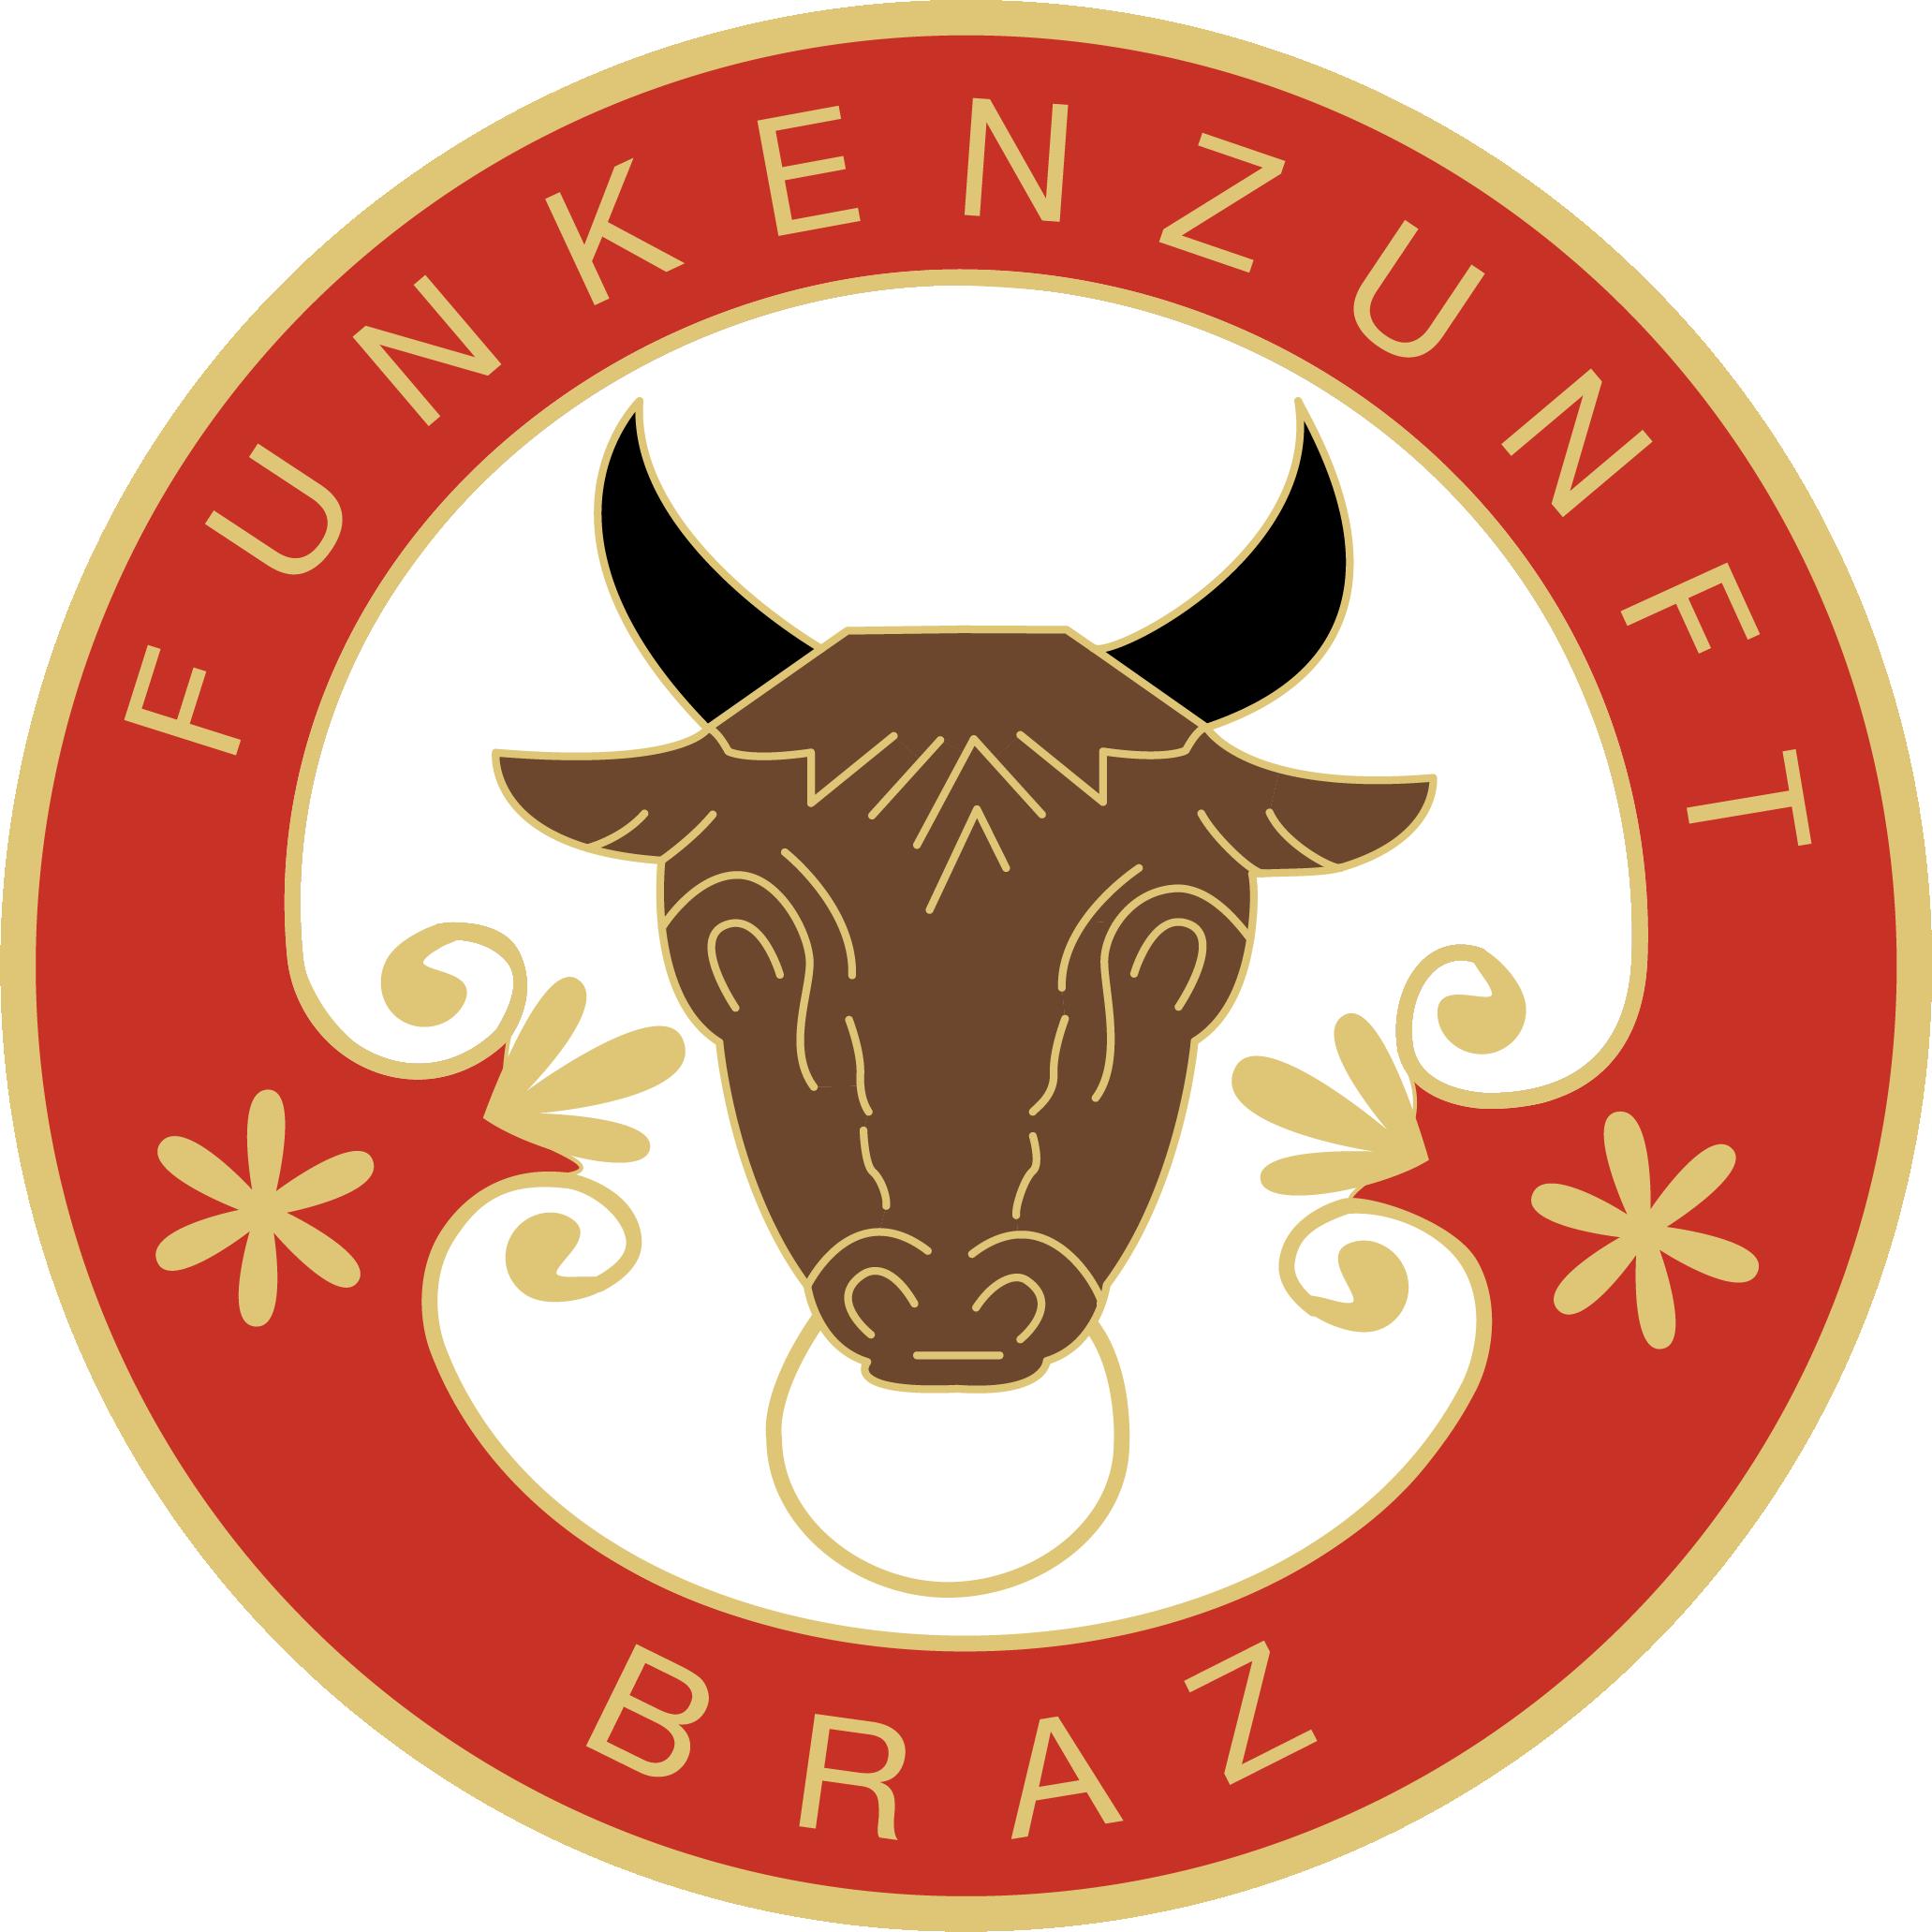 Funkenzunft Braz